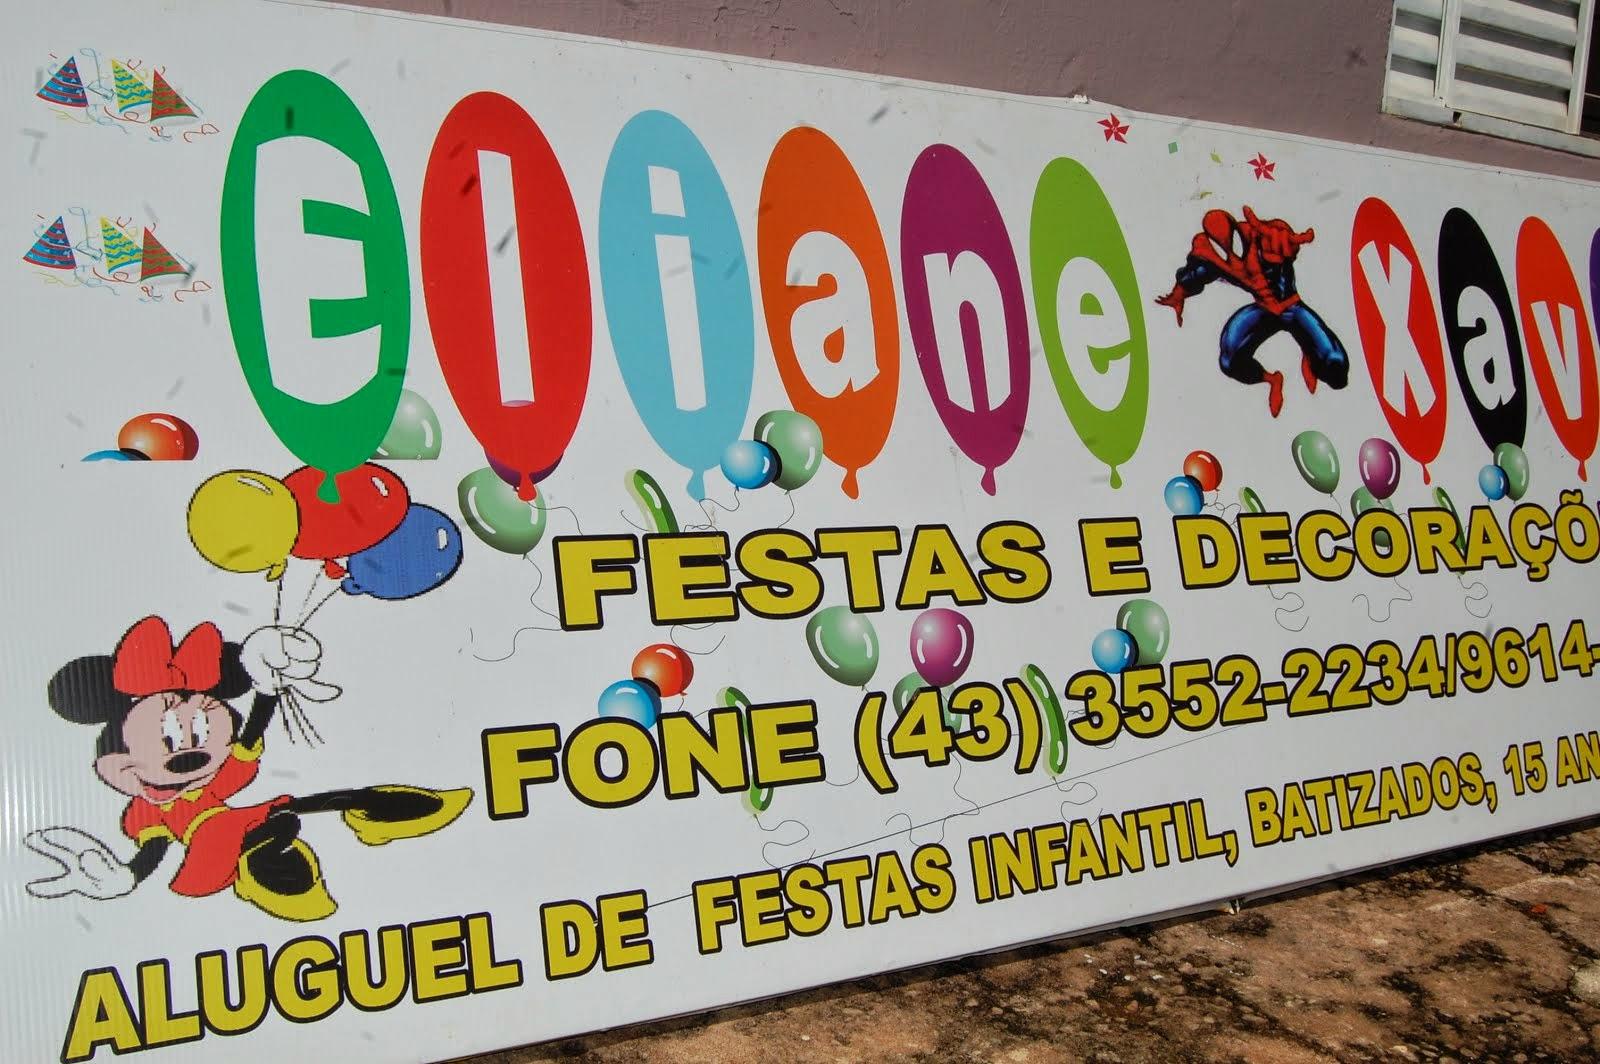 ELIANE XAVIER FESTAS & DECORAÇÕES..